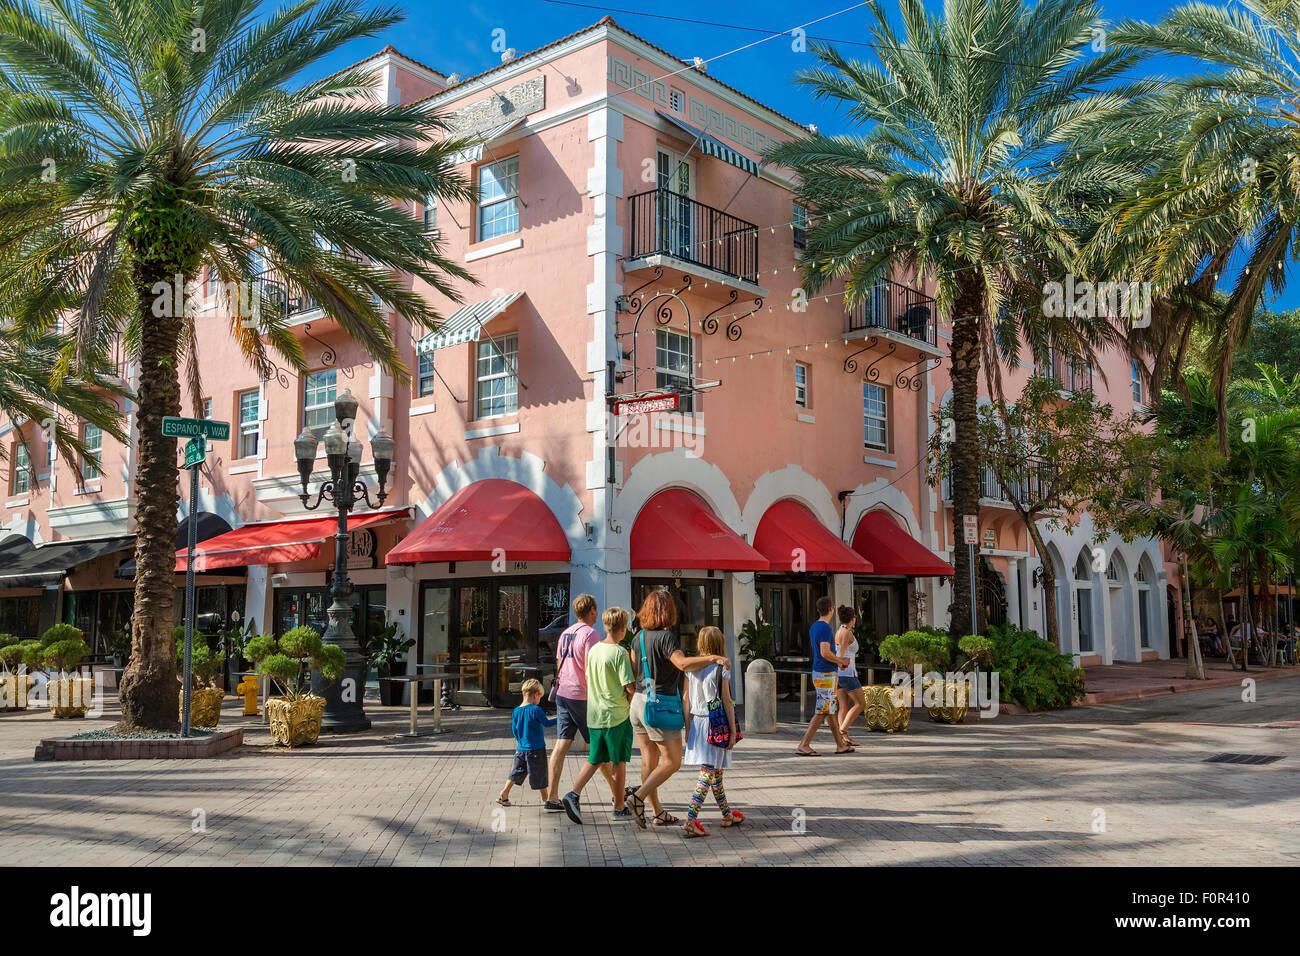 Espanola Way, South Beach, Miami, USA - Stock Image